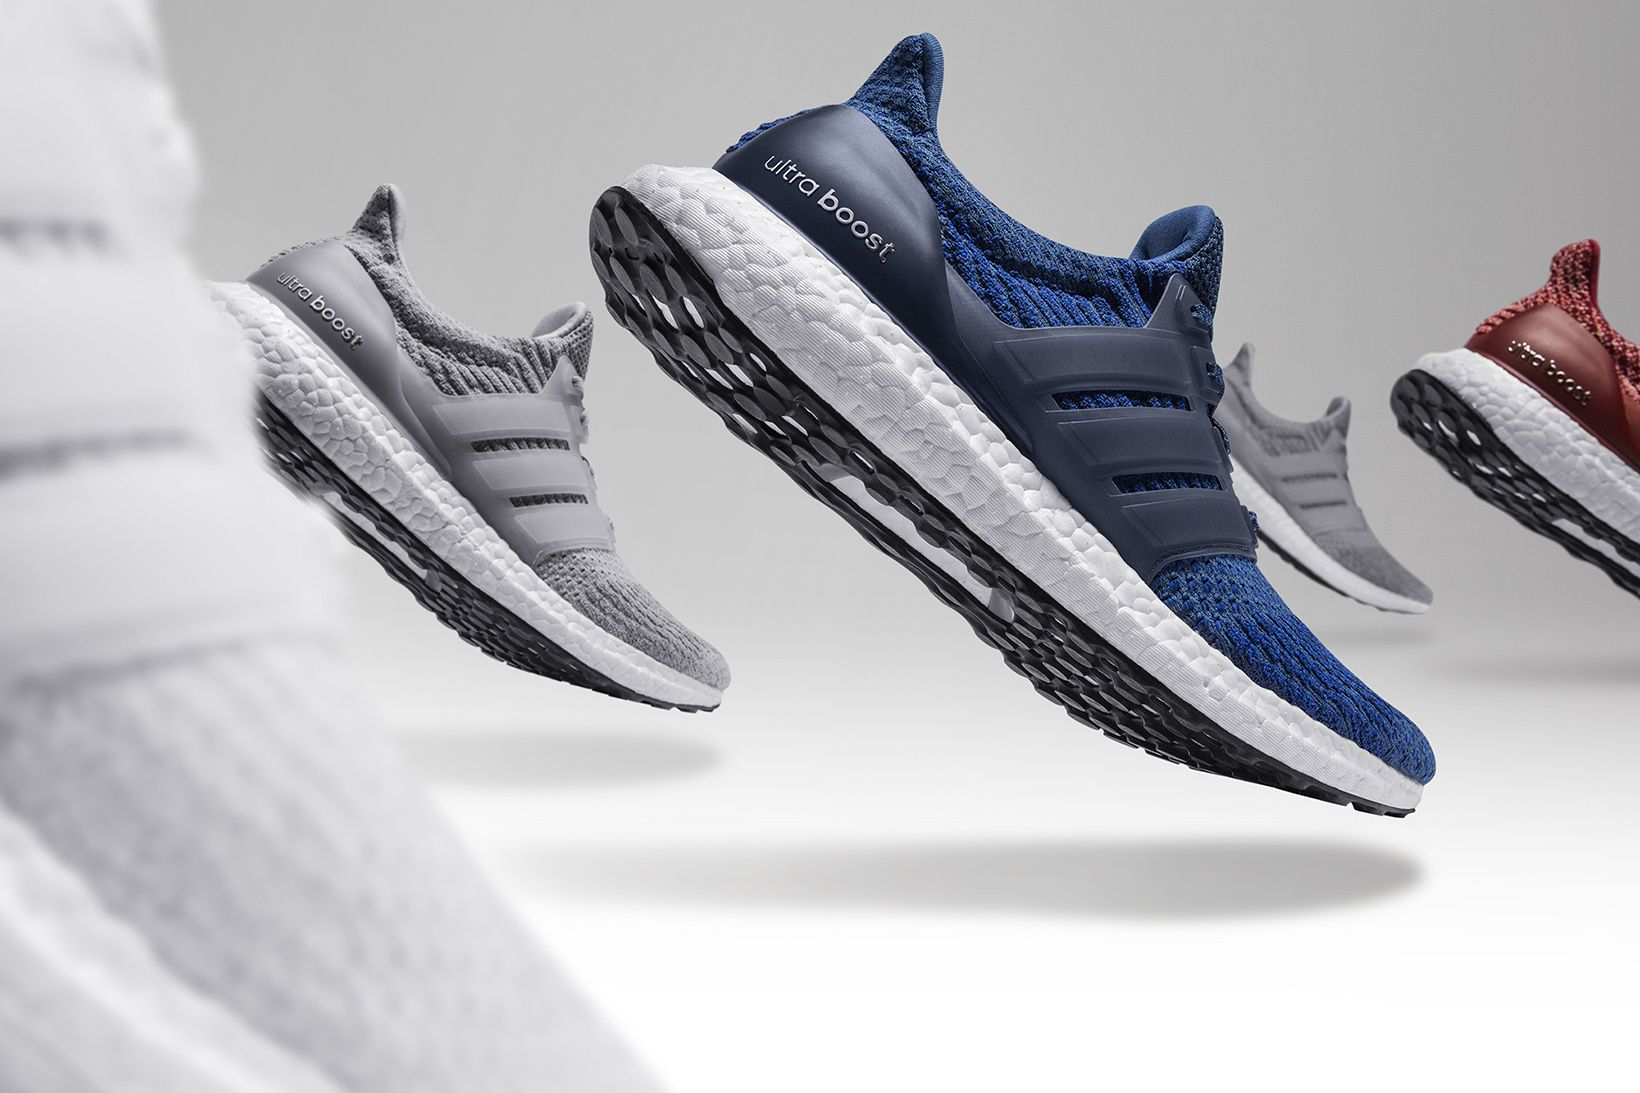 Adidas ufficialmente introduce il ultraboost ultraboost e adidas